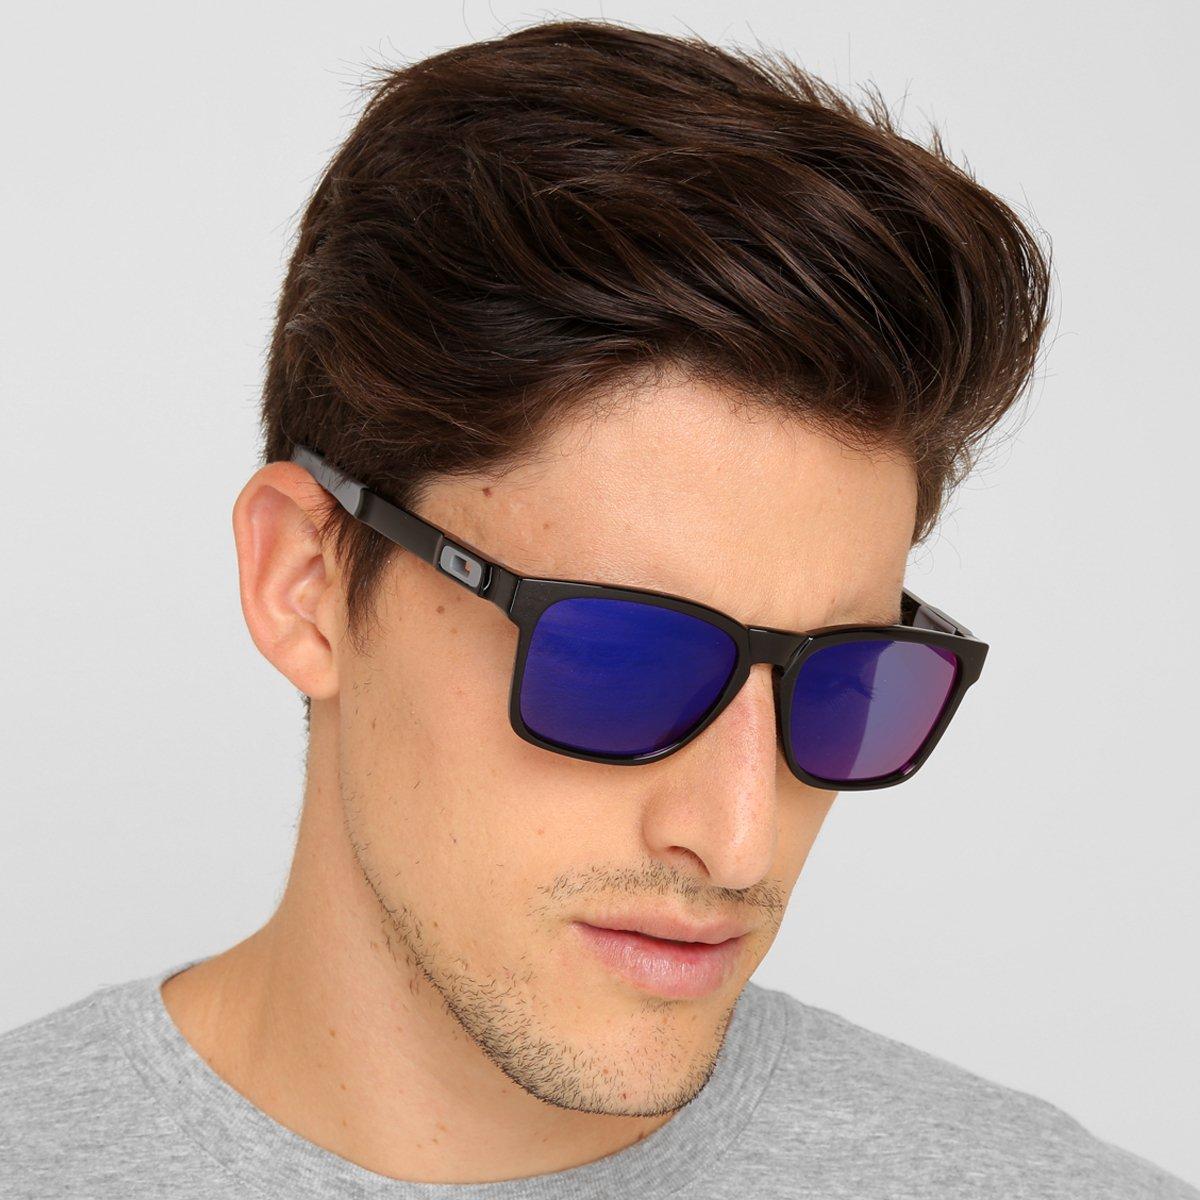 4e8a6f4d22649 Óculos Oakley Catalyst-Iridium - Preto e Roxo - Compre Agora   Zattini